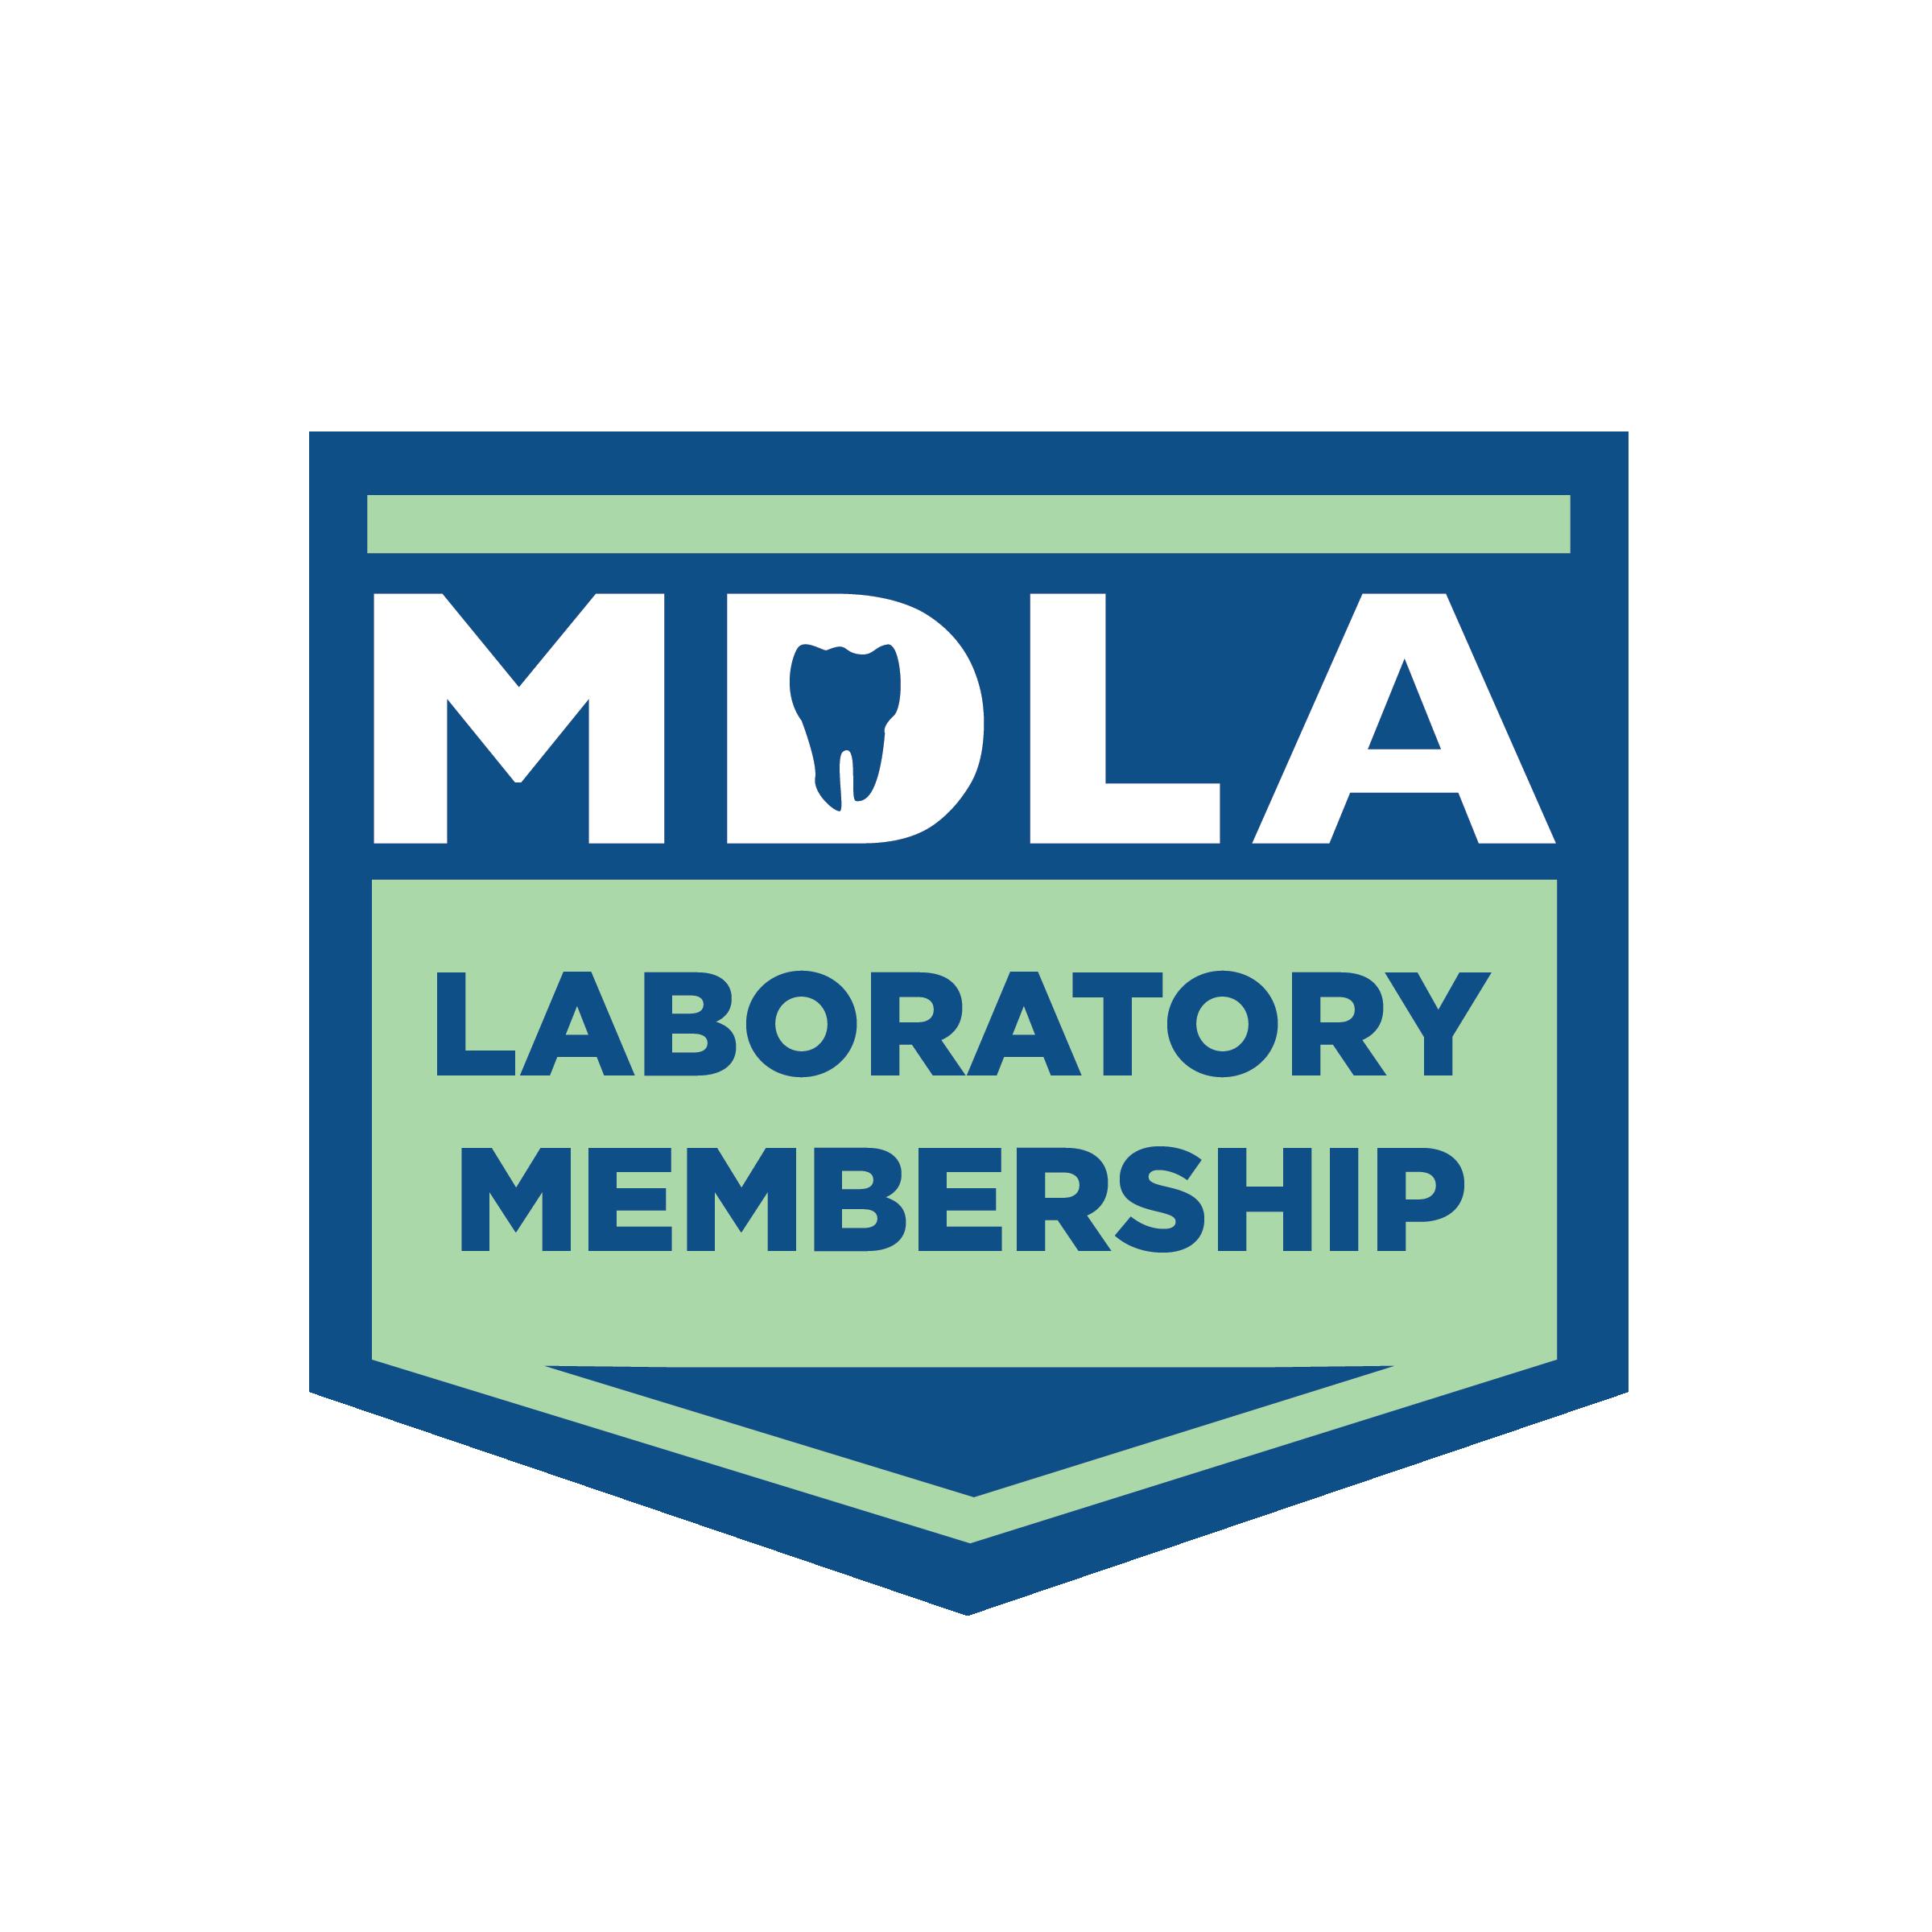 MDLA-Logo-laboratory-1-01.png